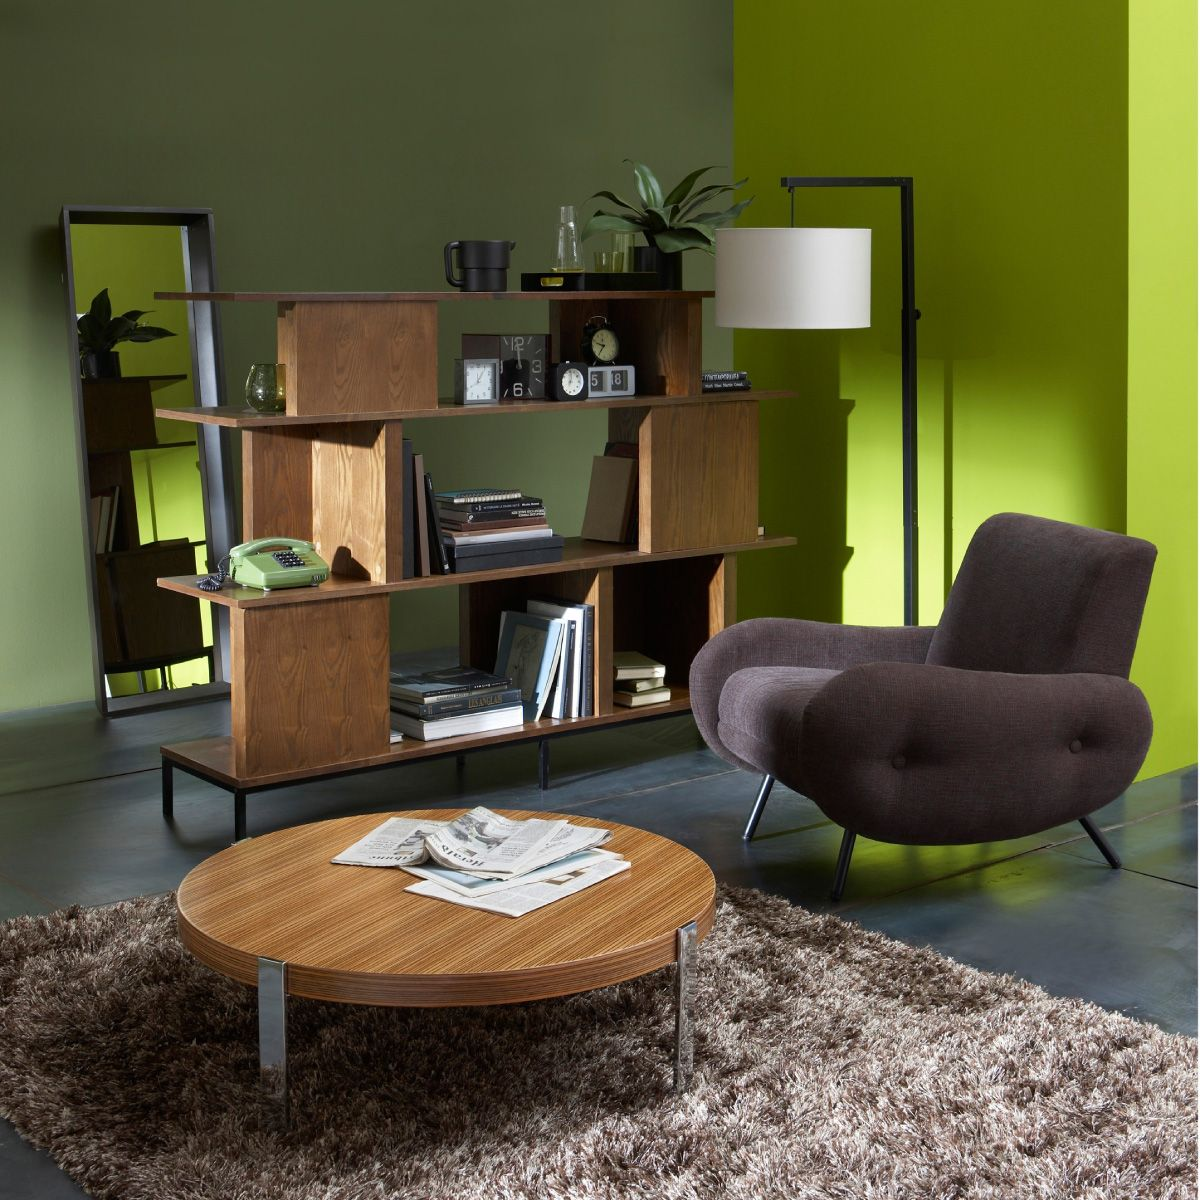 coup d 39 bluff d co ann es 50. Black Bedroom Furniture Sets. Home Design Ideas